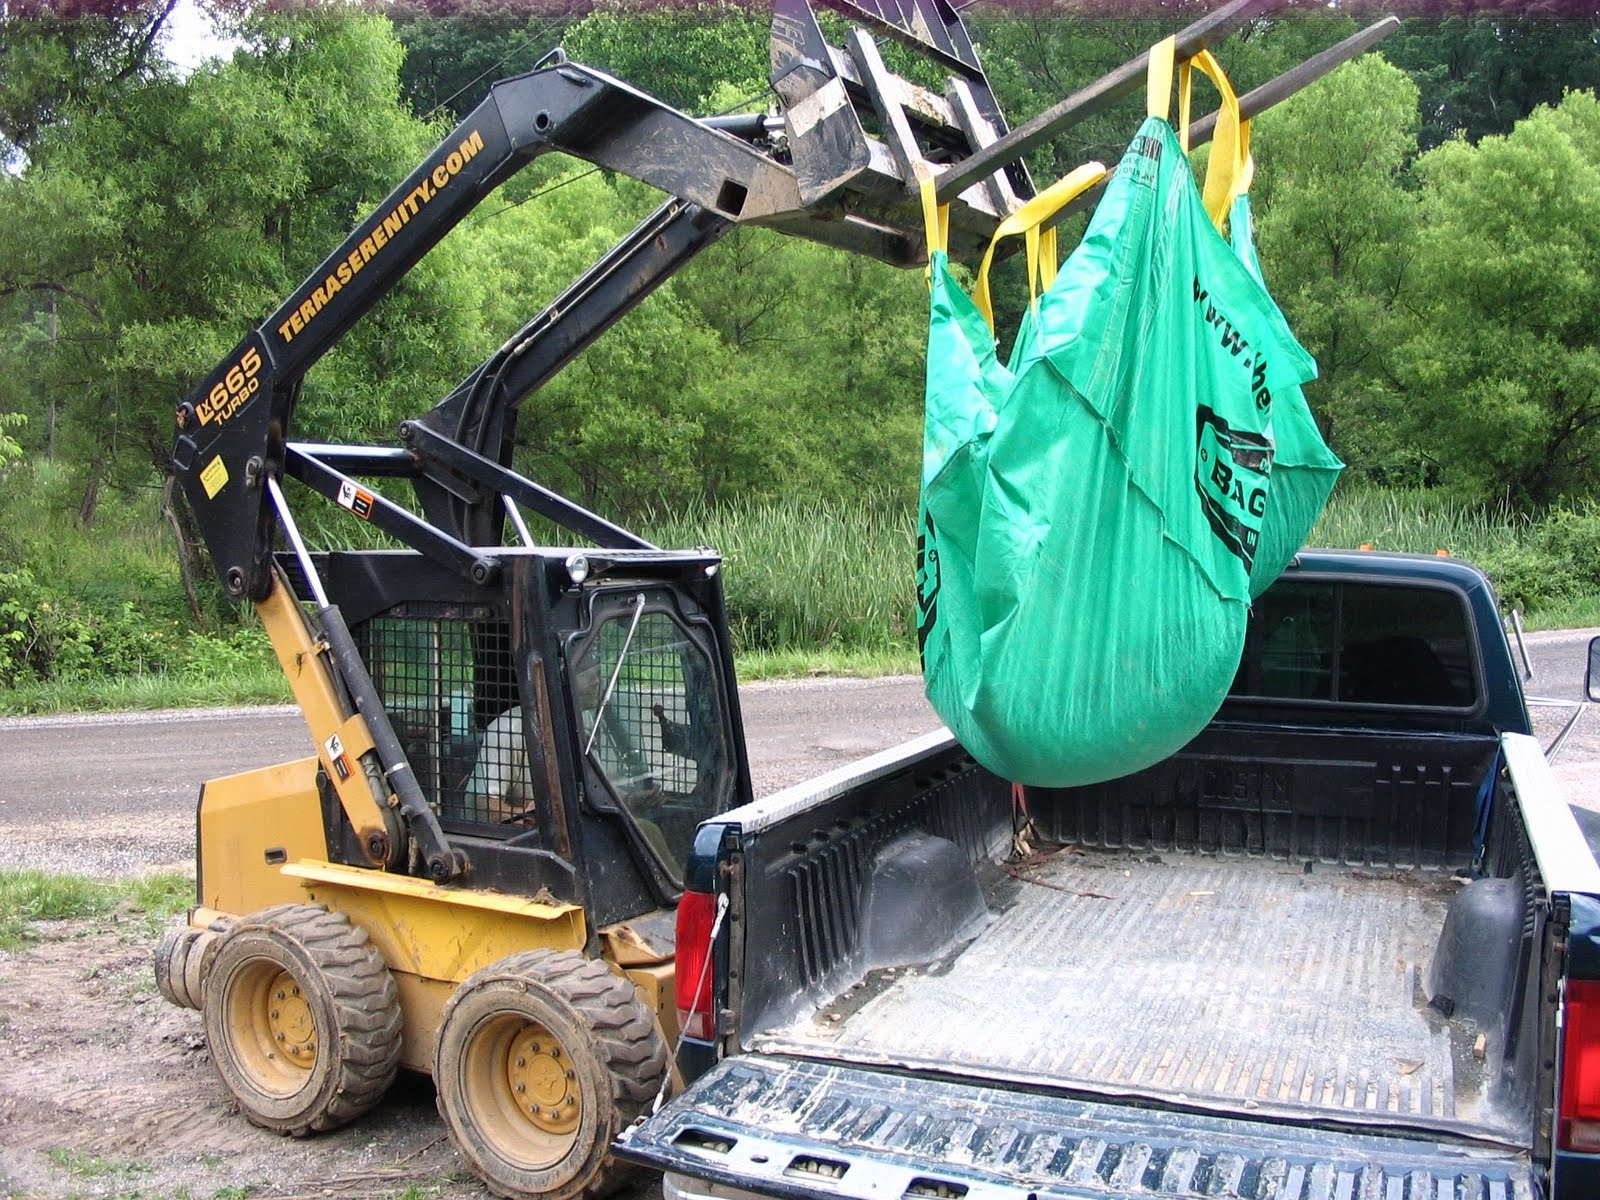 ROCKIN WALLS: Tool - Bagster dumpster